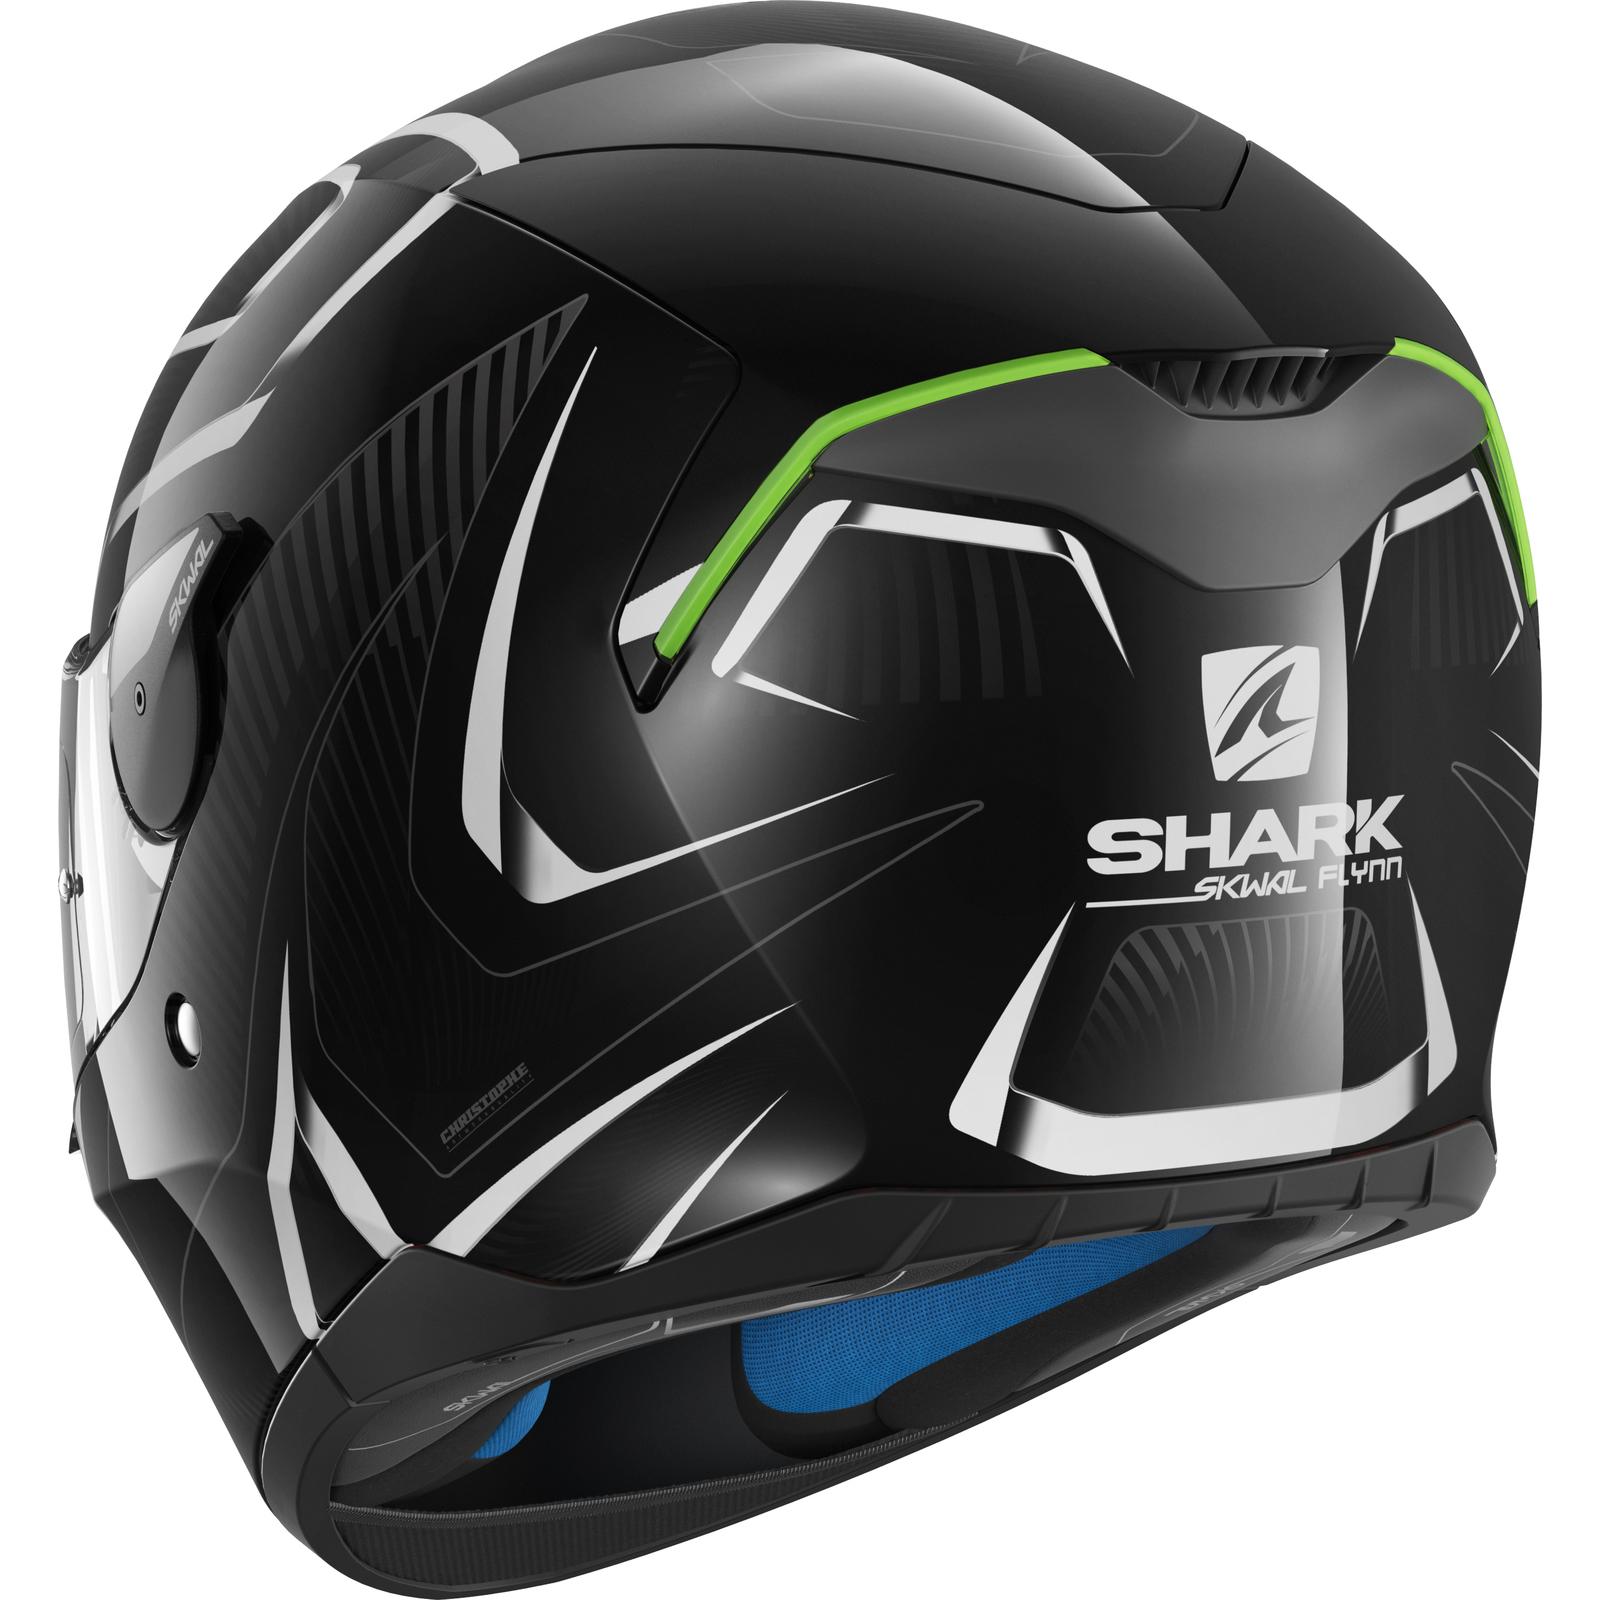 shark skwal flynn motorcycle helmet led biker full face lid sharktooth prepared ebay. Black Bedroom Furniture Sets. Home Design Ideas